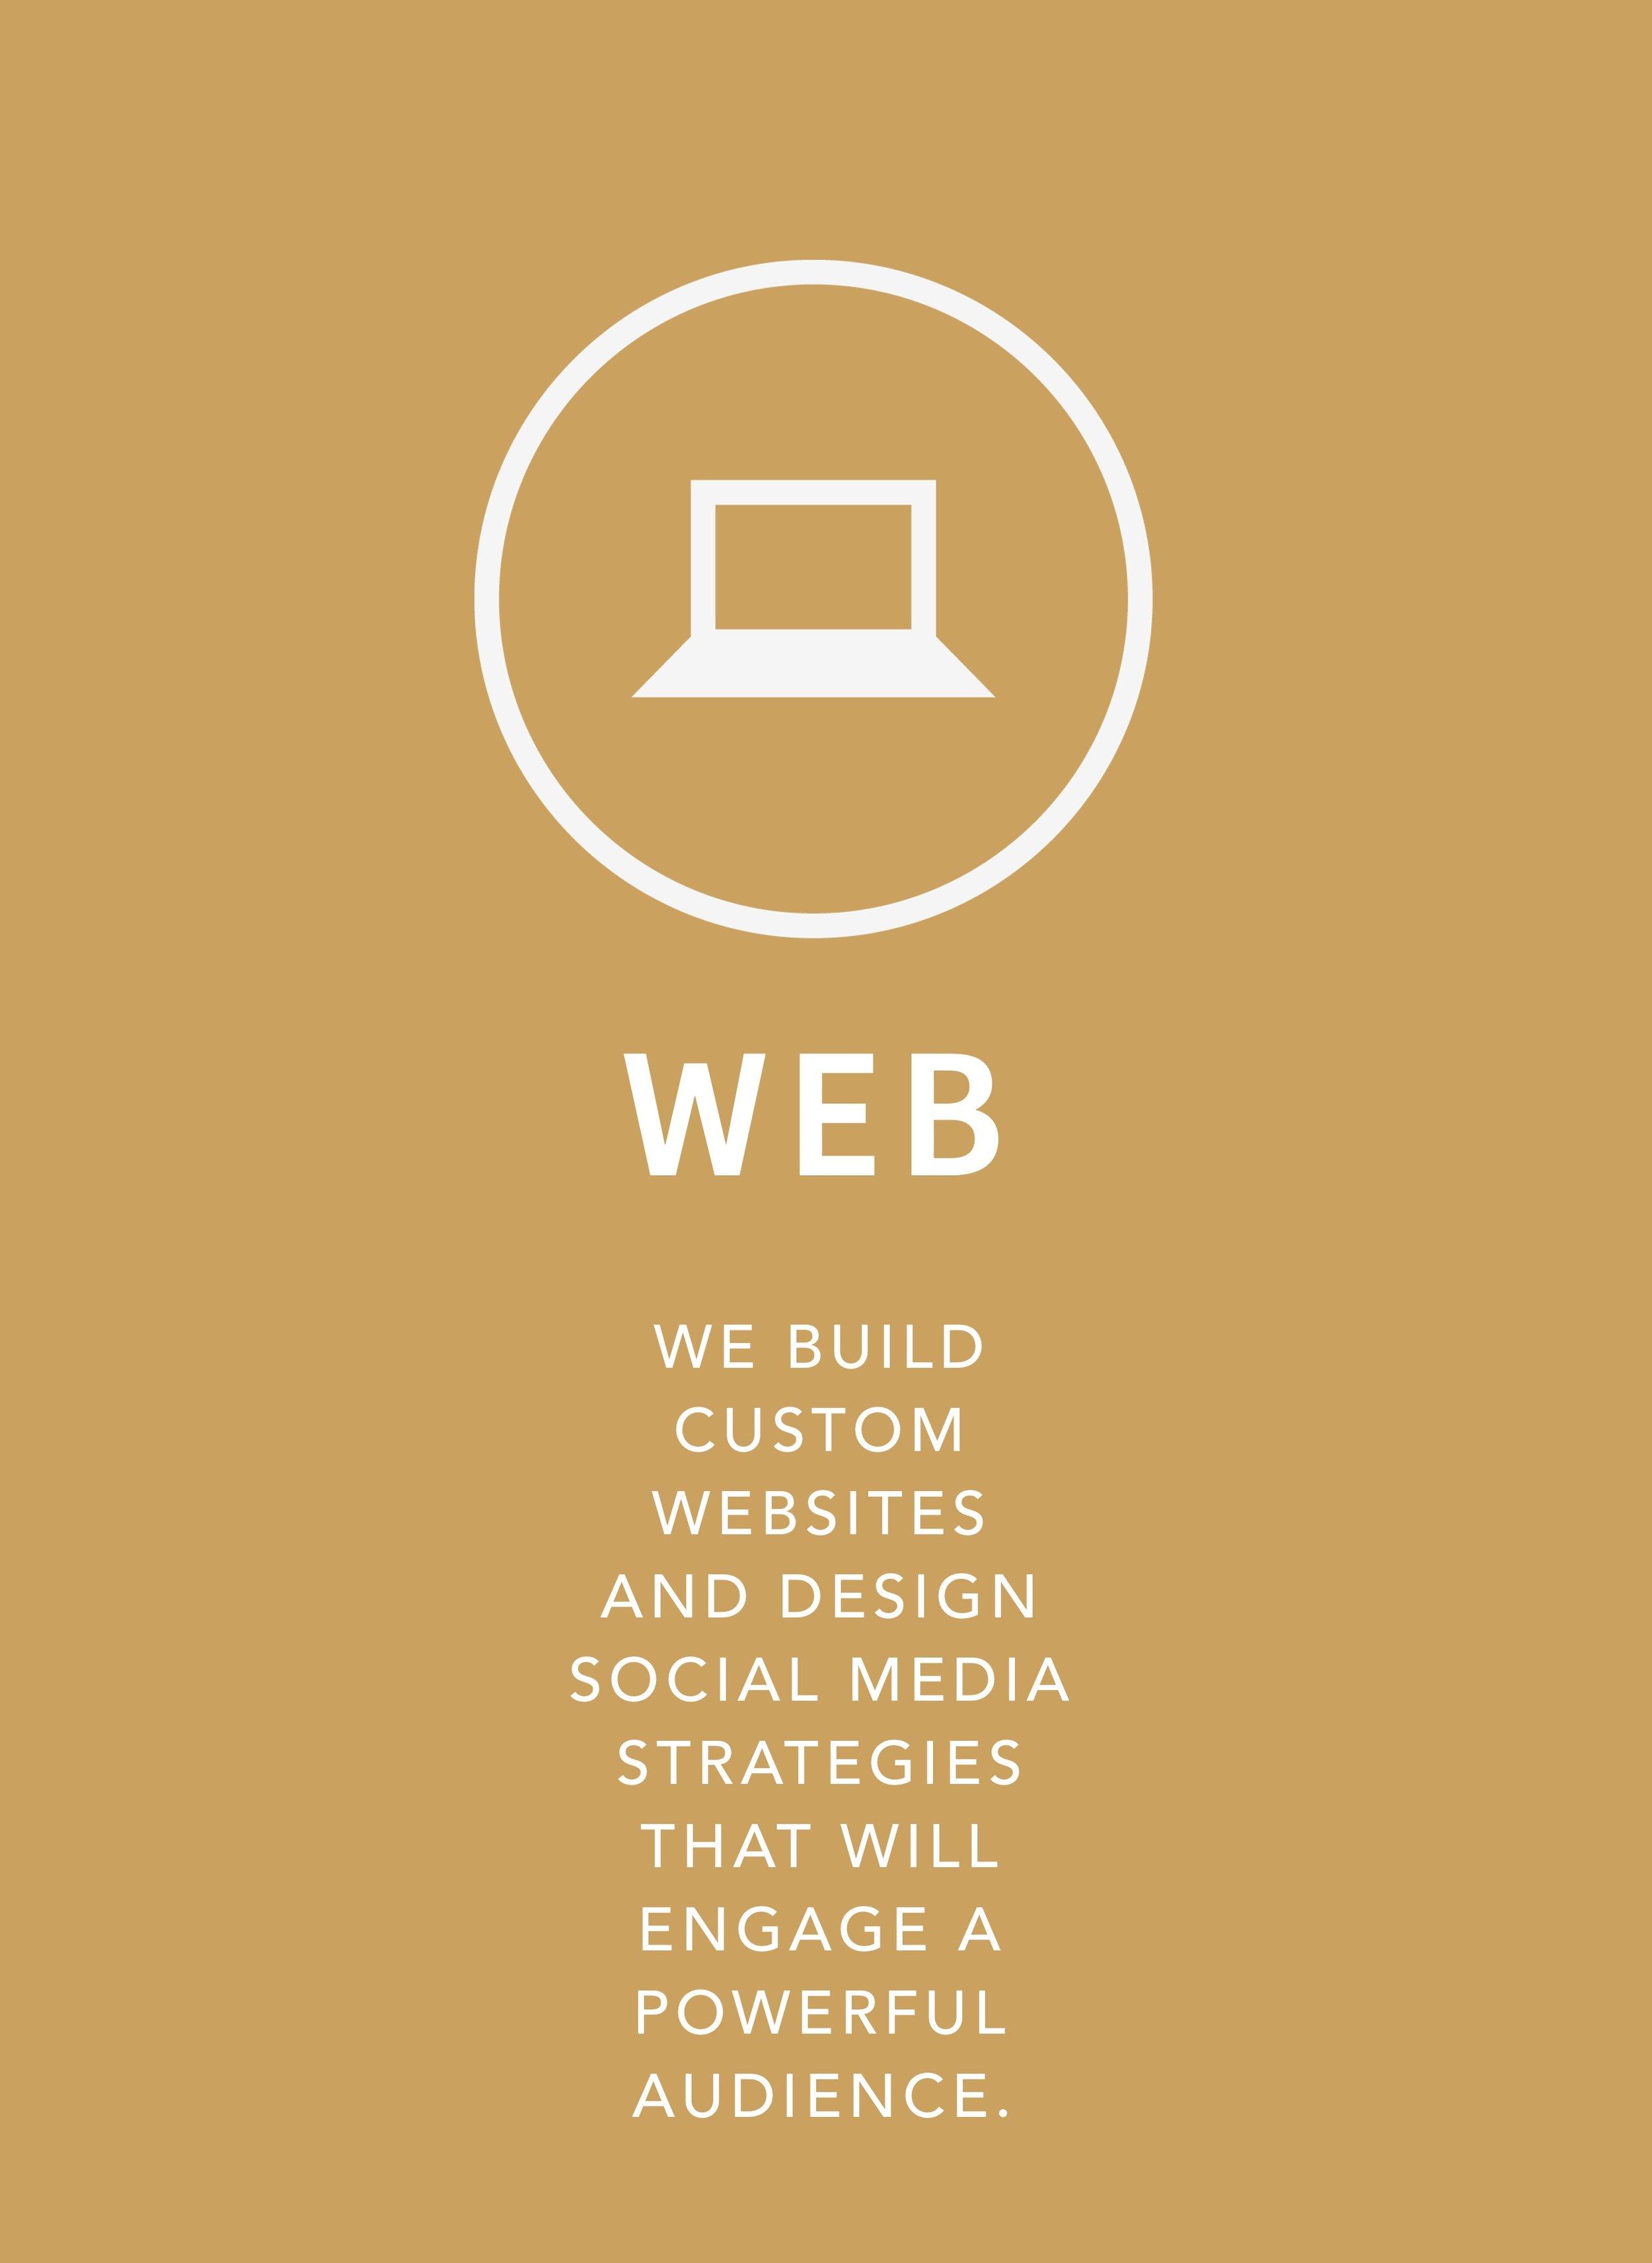 amplify creative services - web.jpg